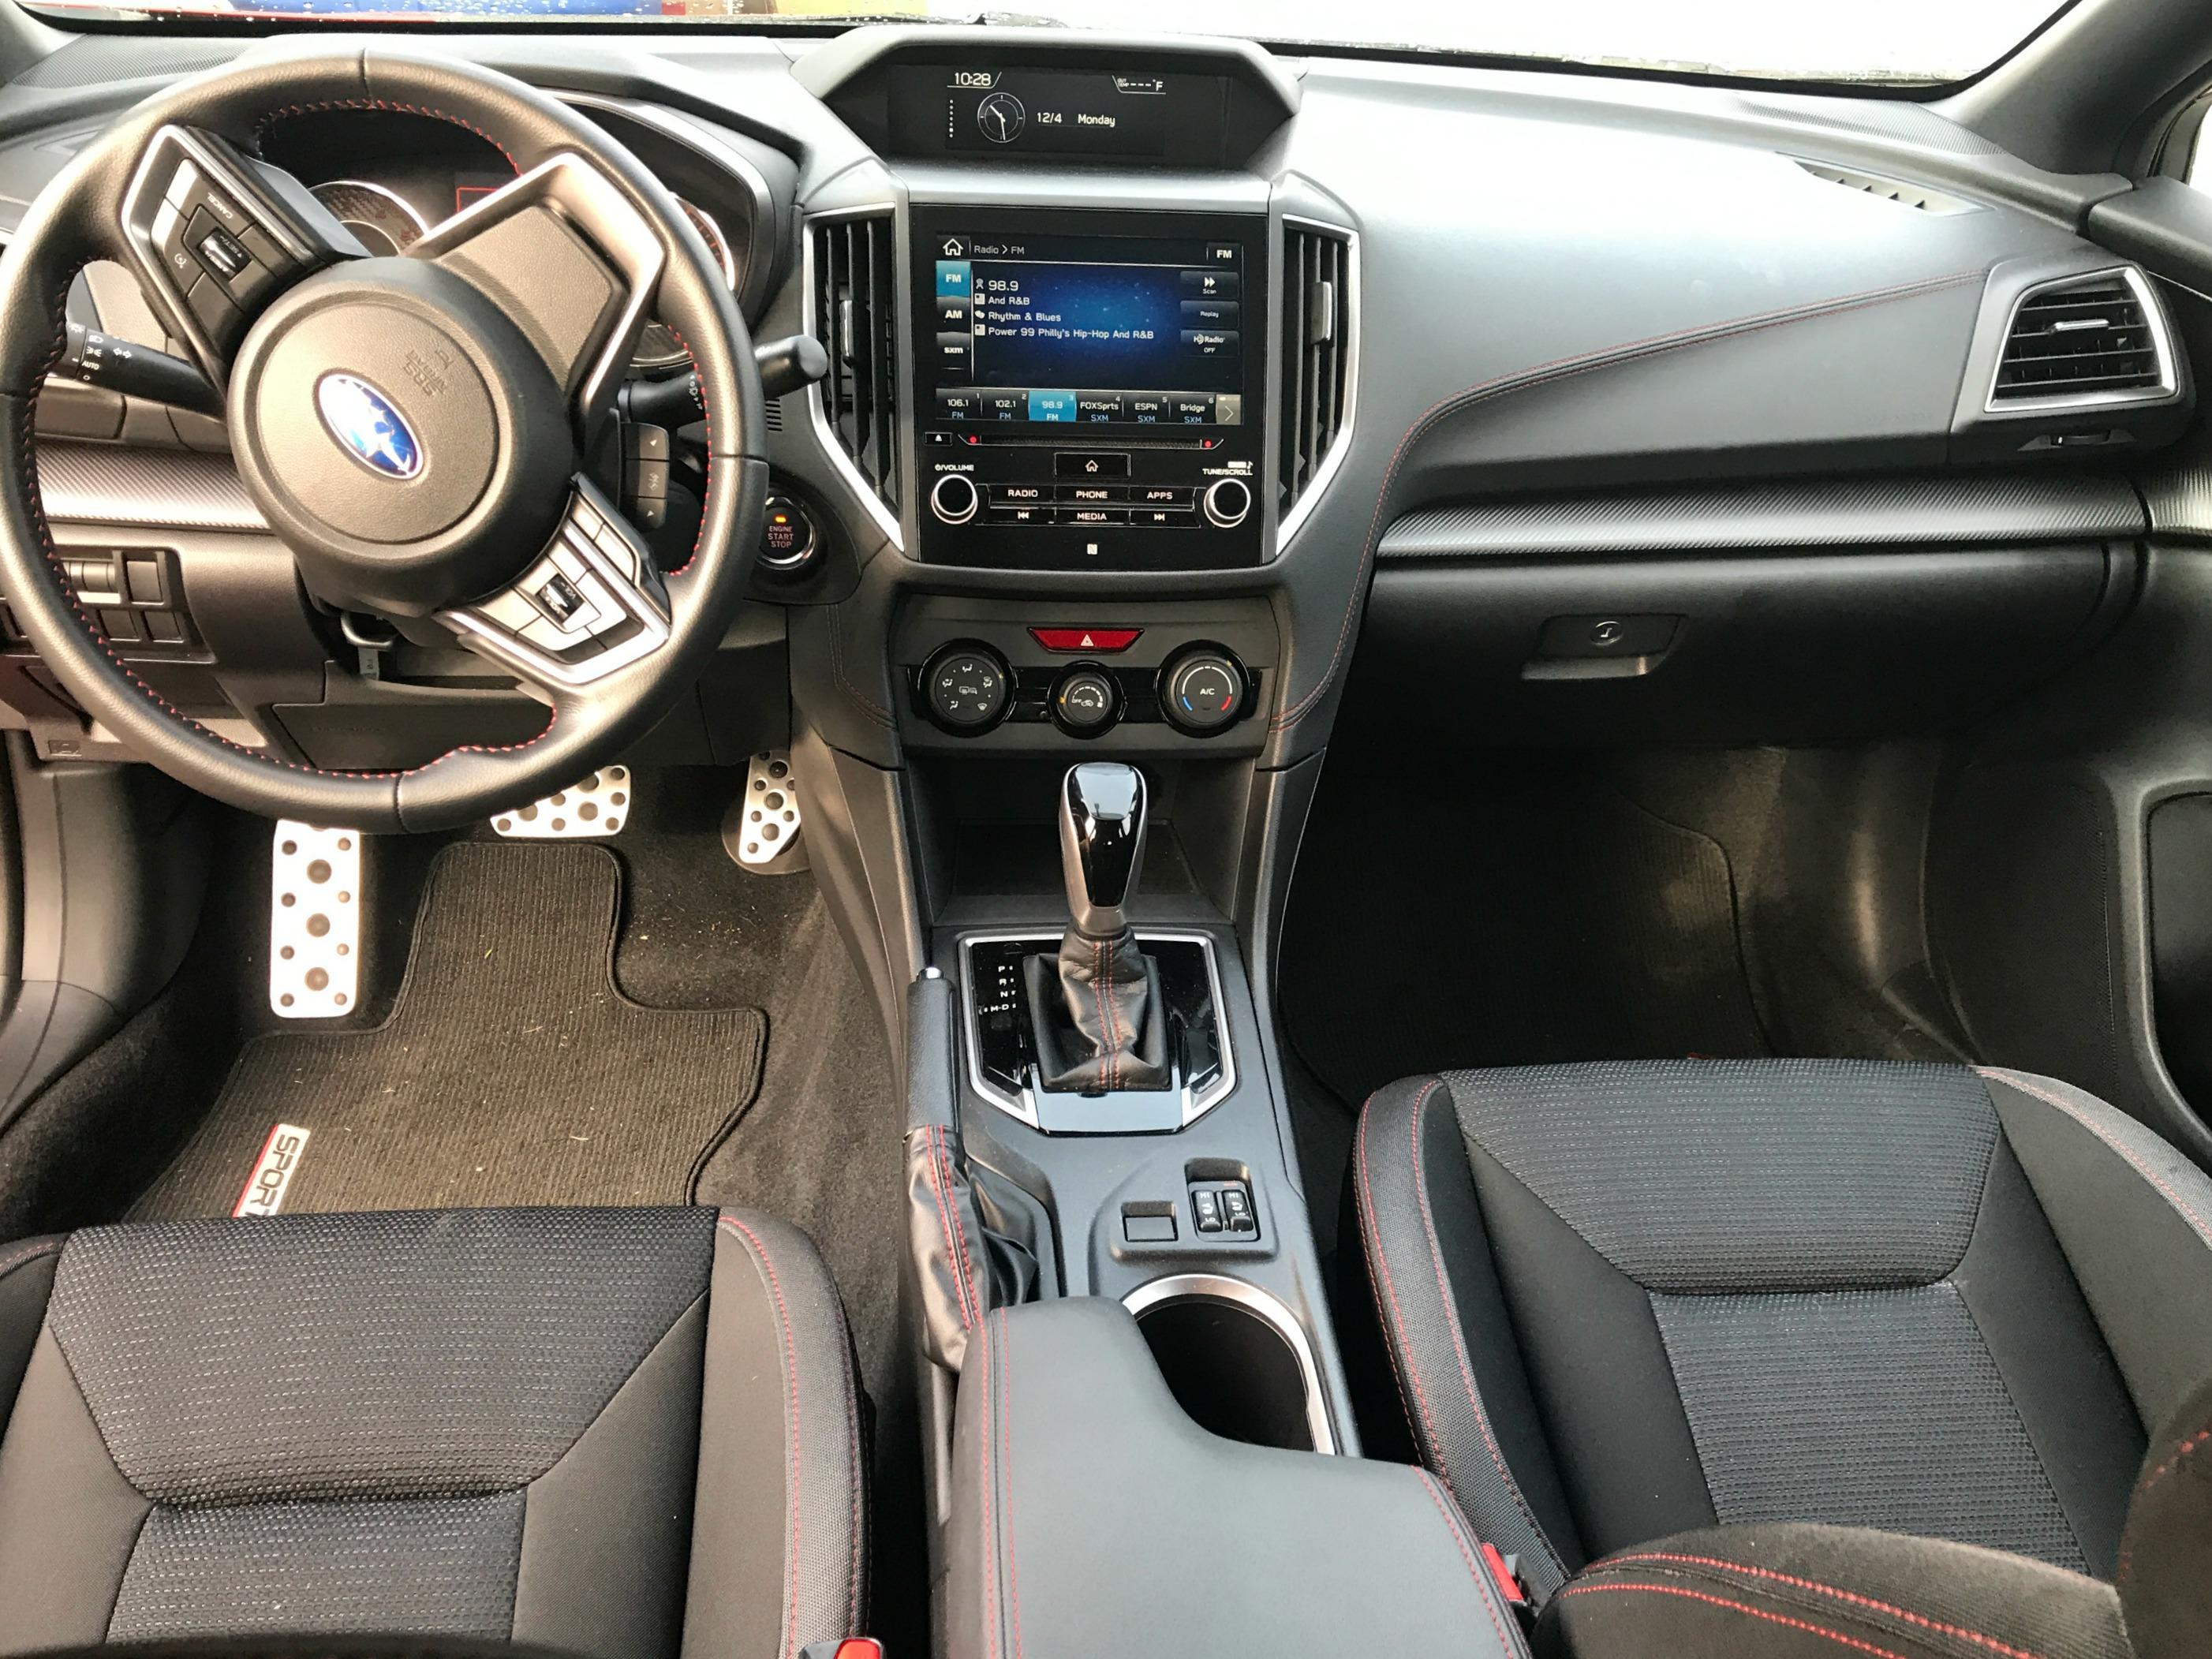 Grey 2017 Impreza AWD sedan interior dashboard